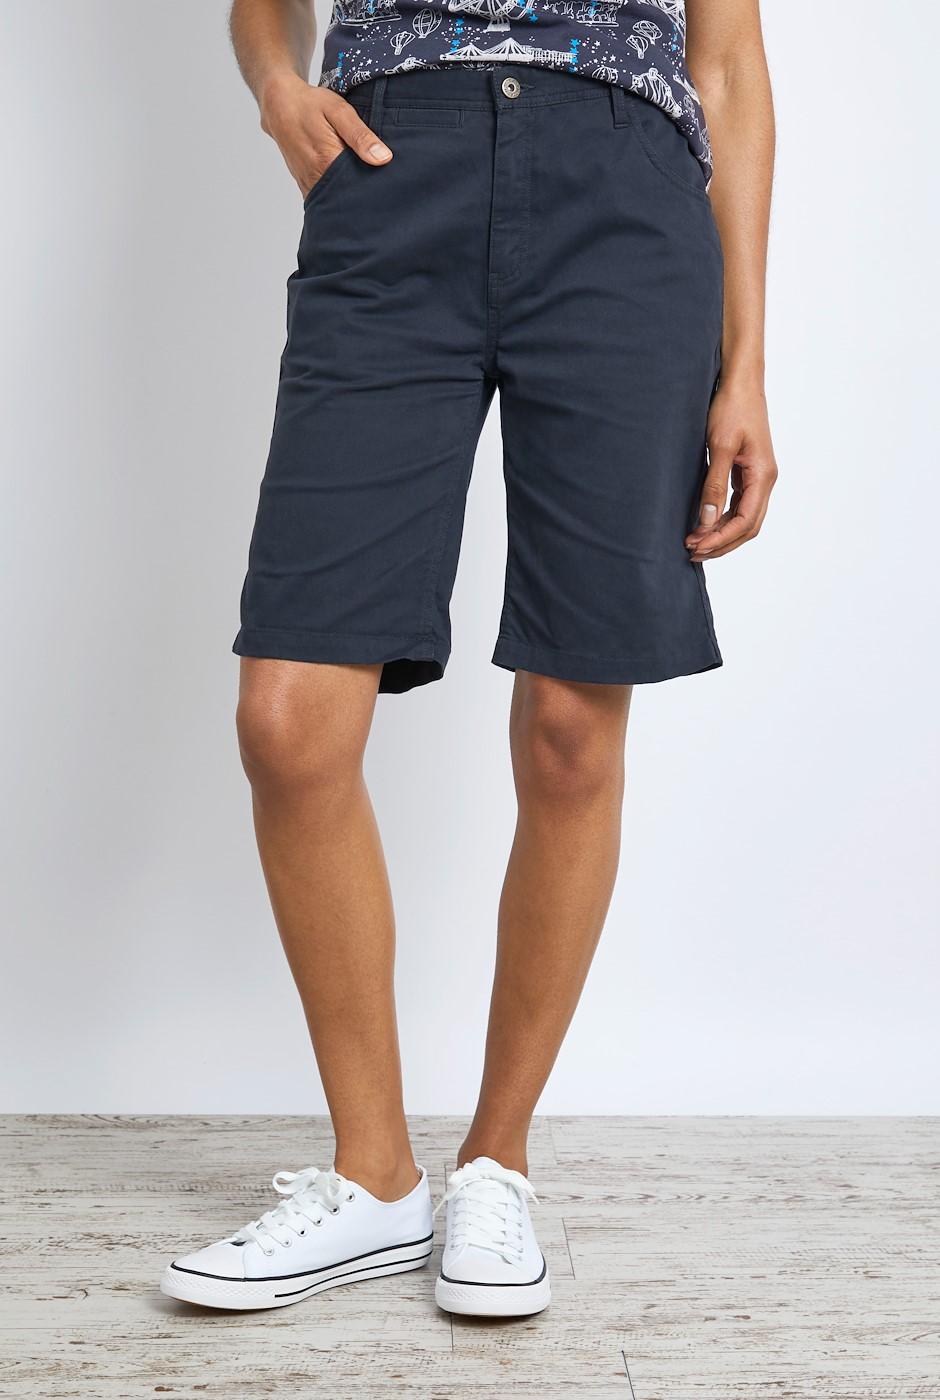 Vittoria Organic Cotton Bermuda Shorts Navy